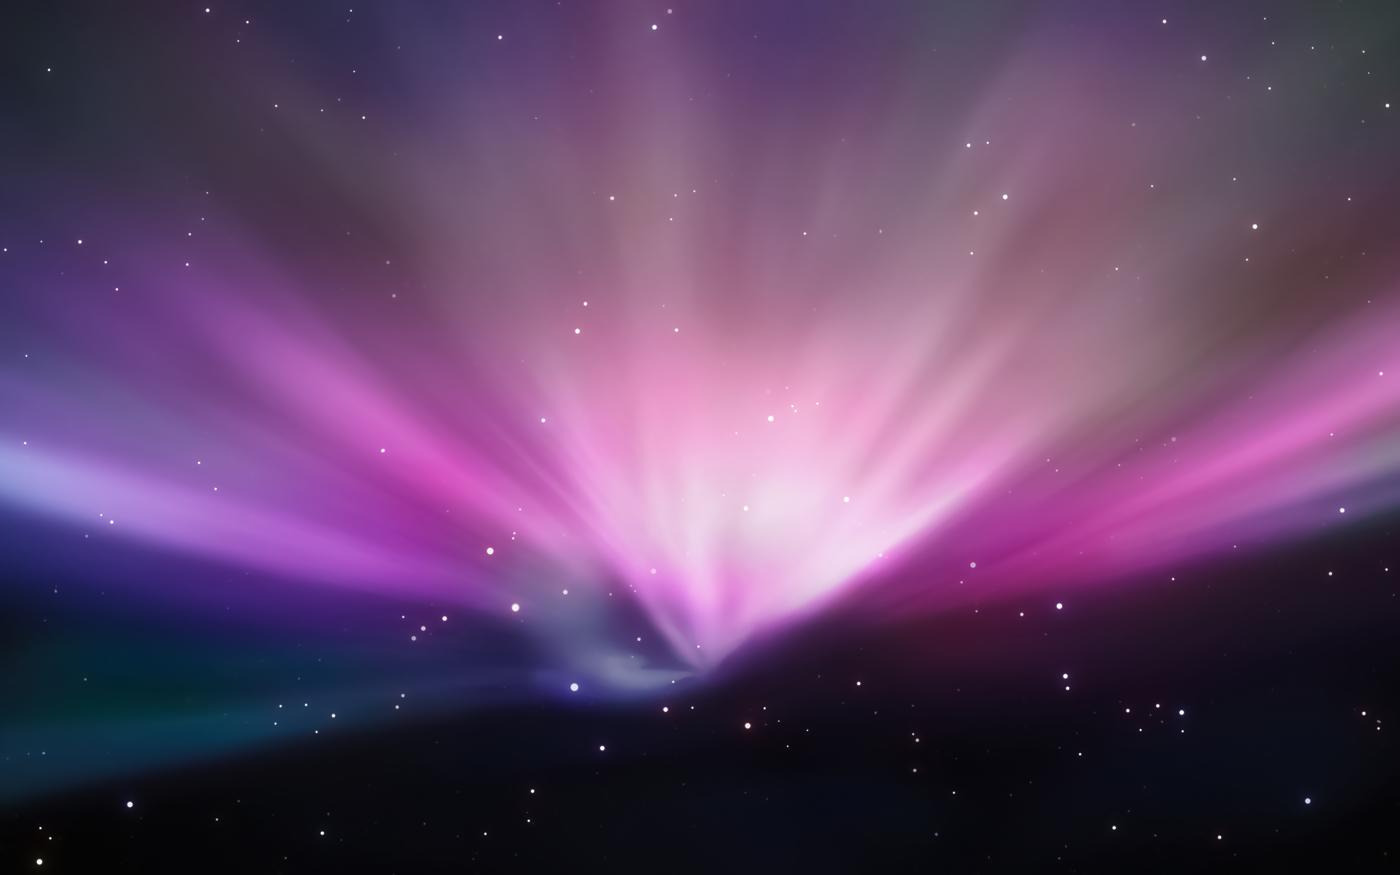 Fondo de pantalla de OS X 10.5 Leopard